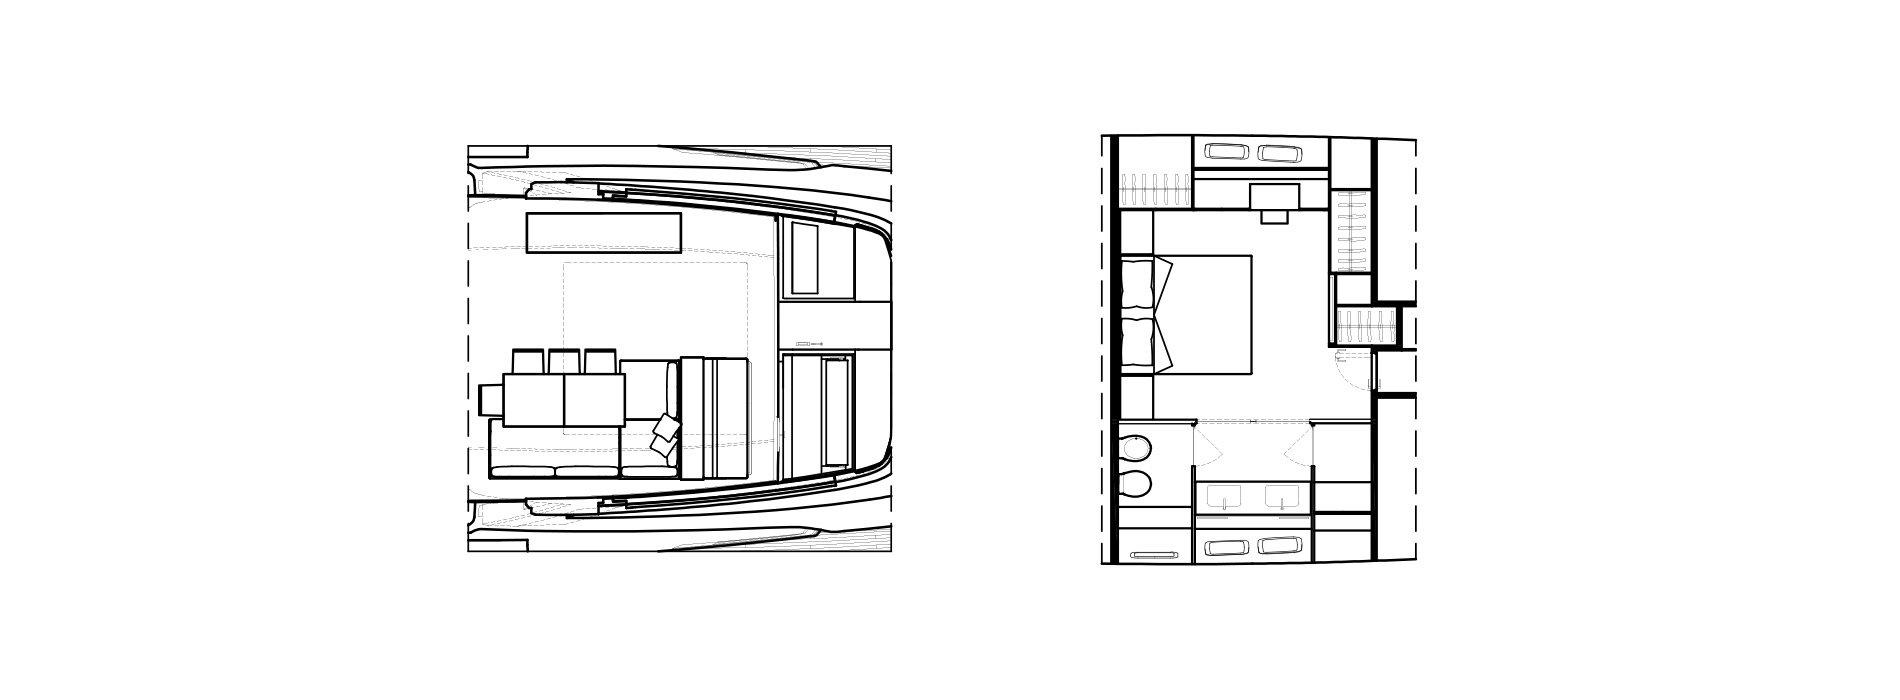 Sanlorenzo Yachts SX88 Details Version A